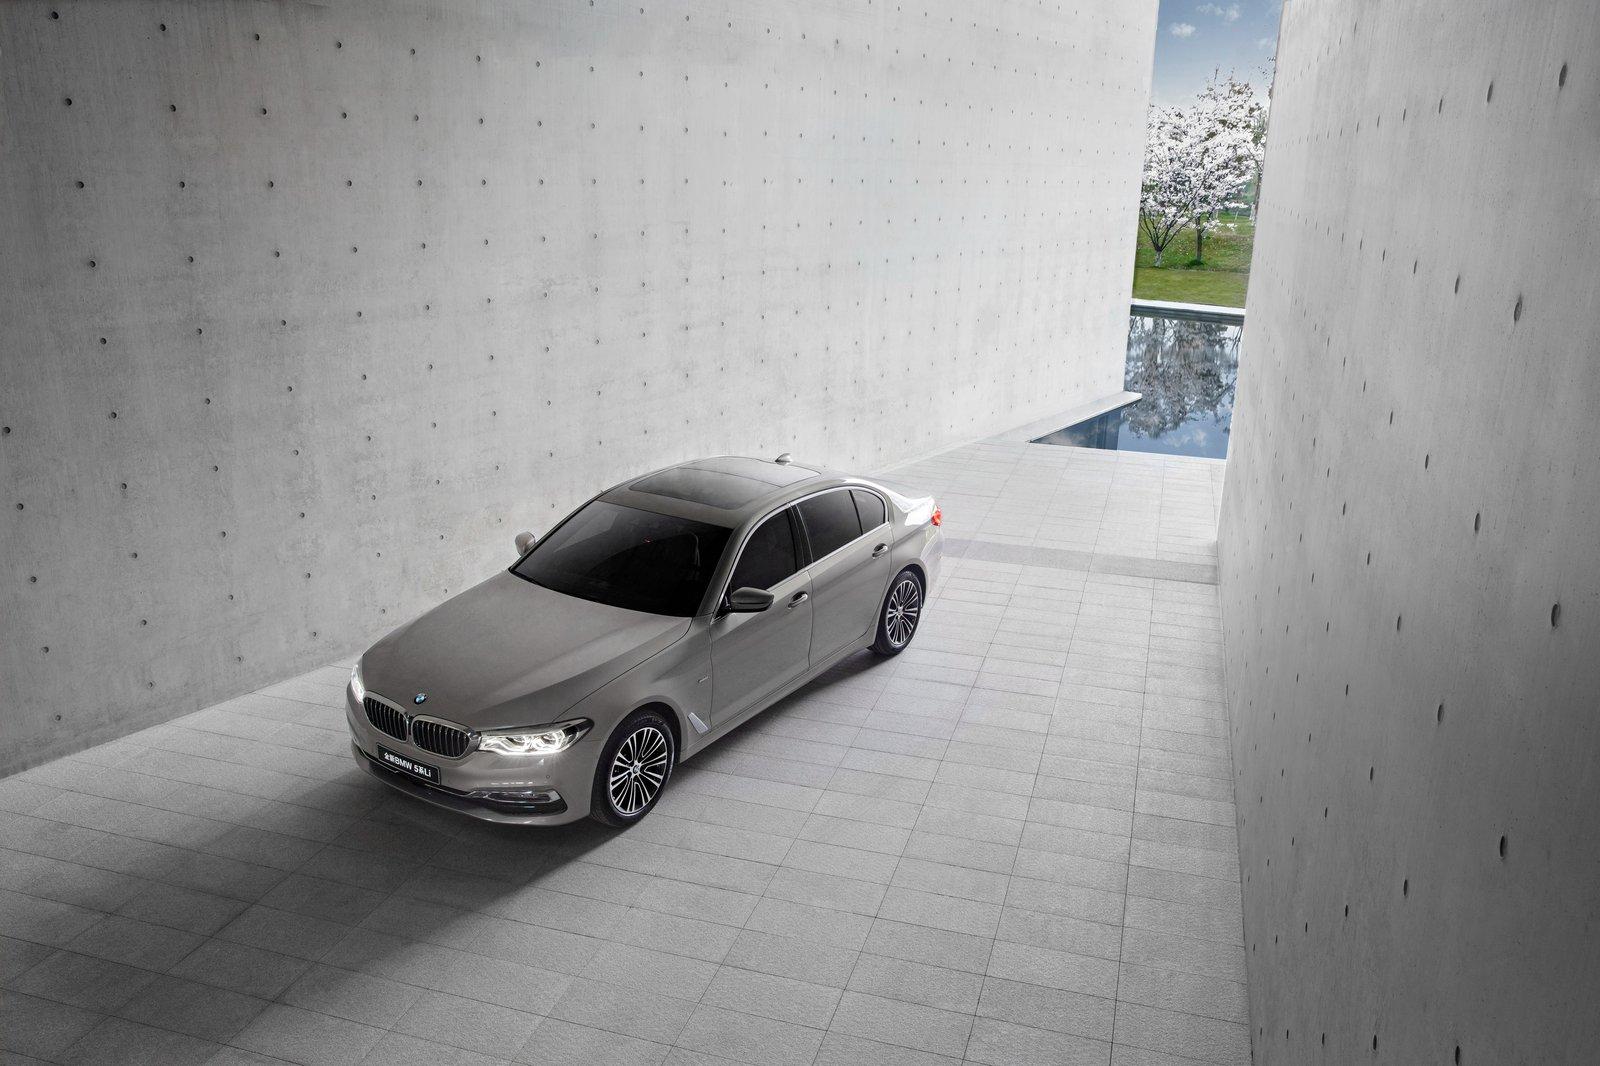 BMW-5-Series-LWB-3.jpg